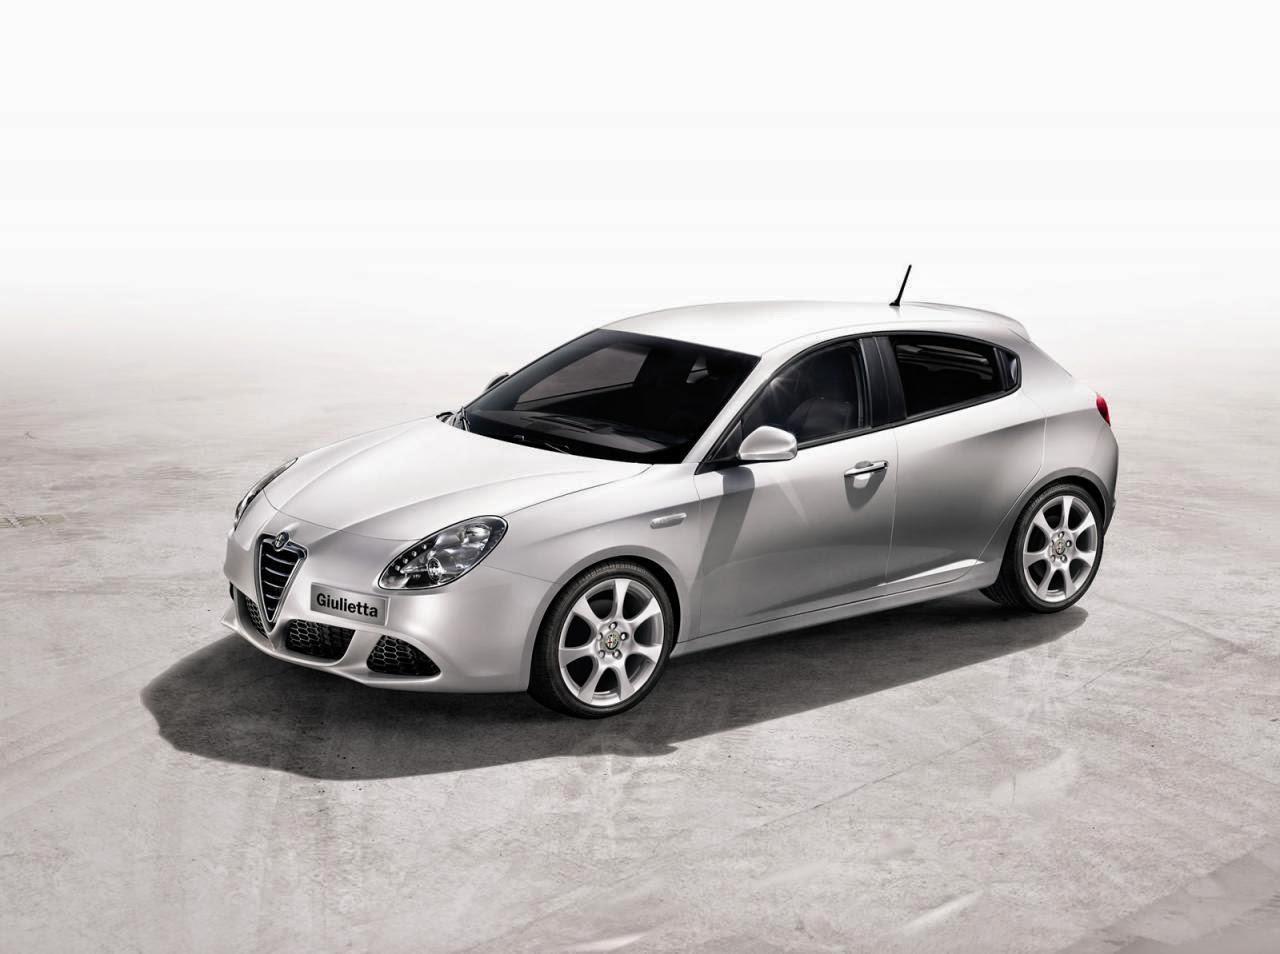 Alfa Romeo Giulietta Wallpaper